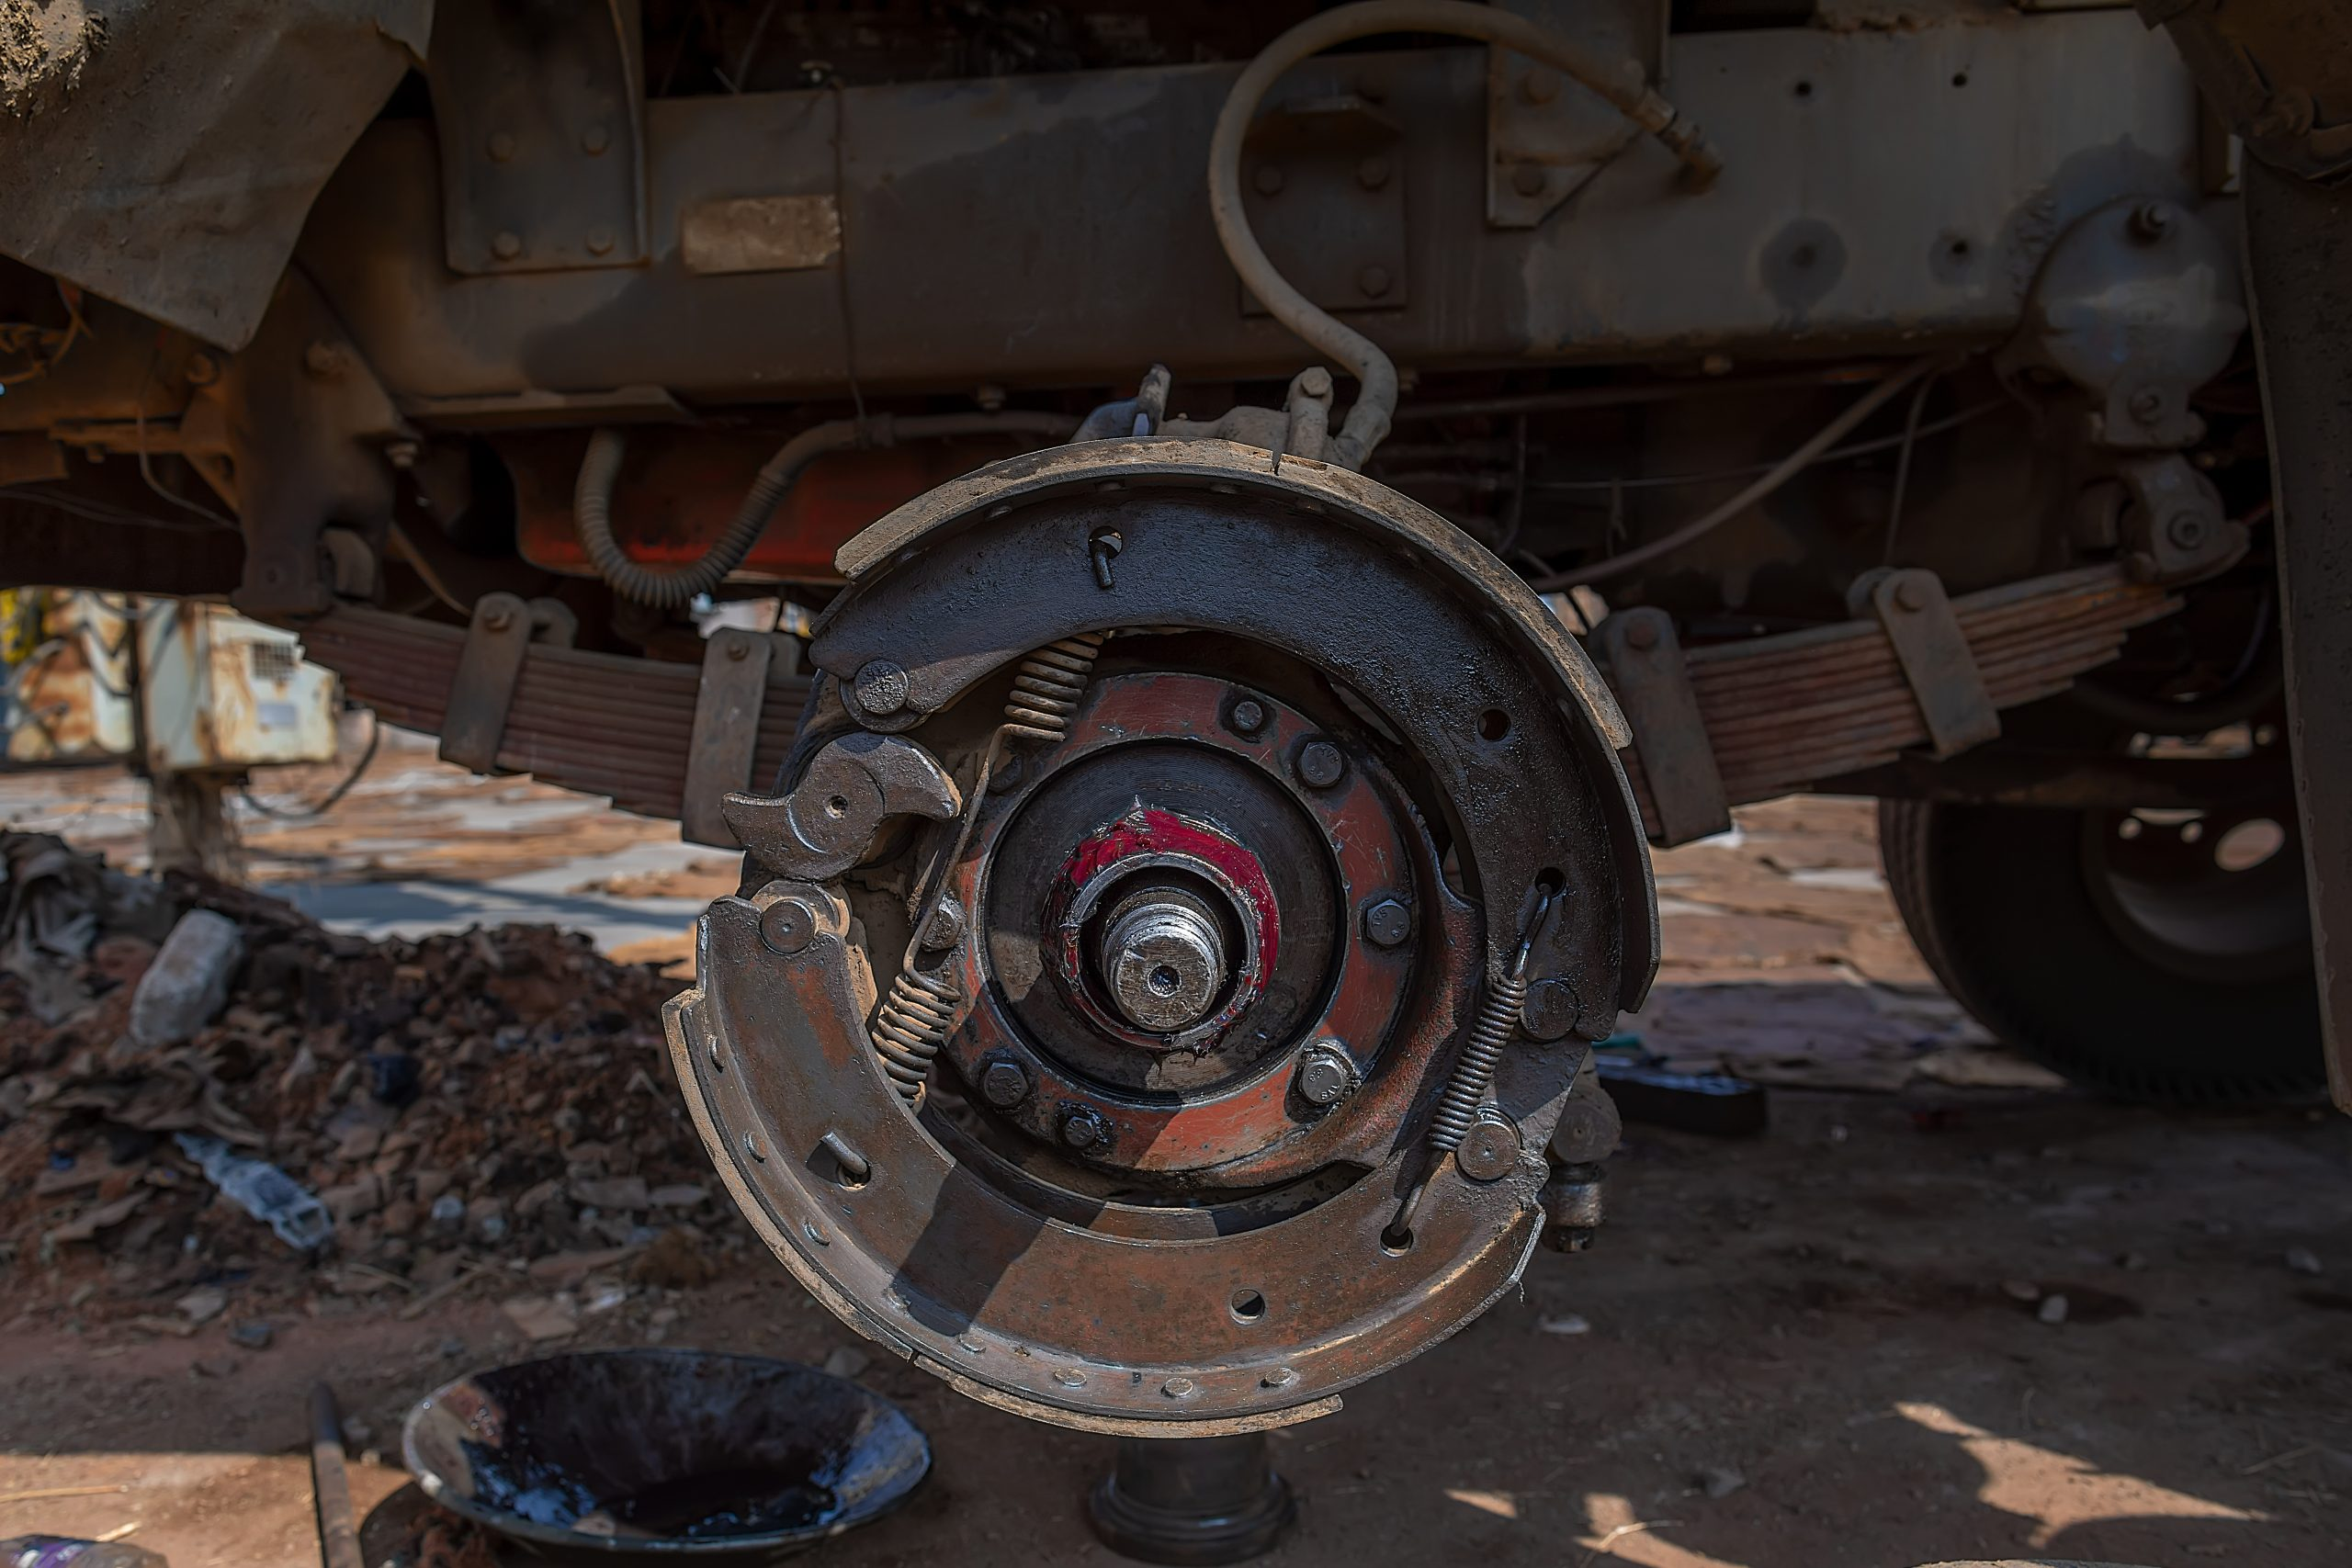 Wheel hub of a truck